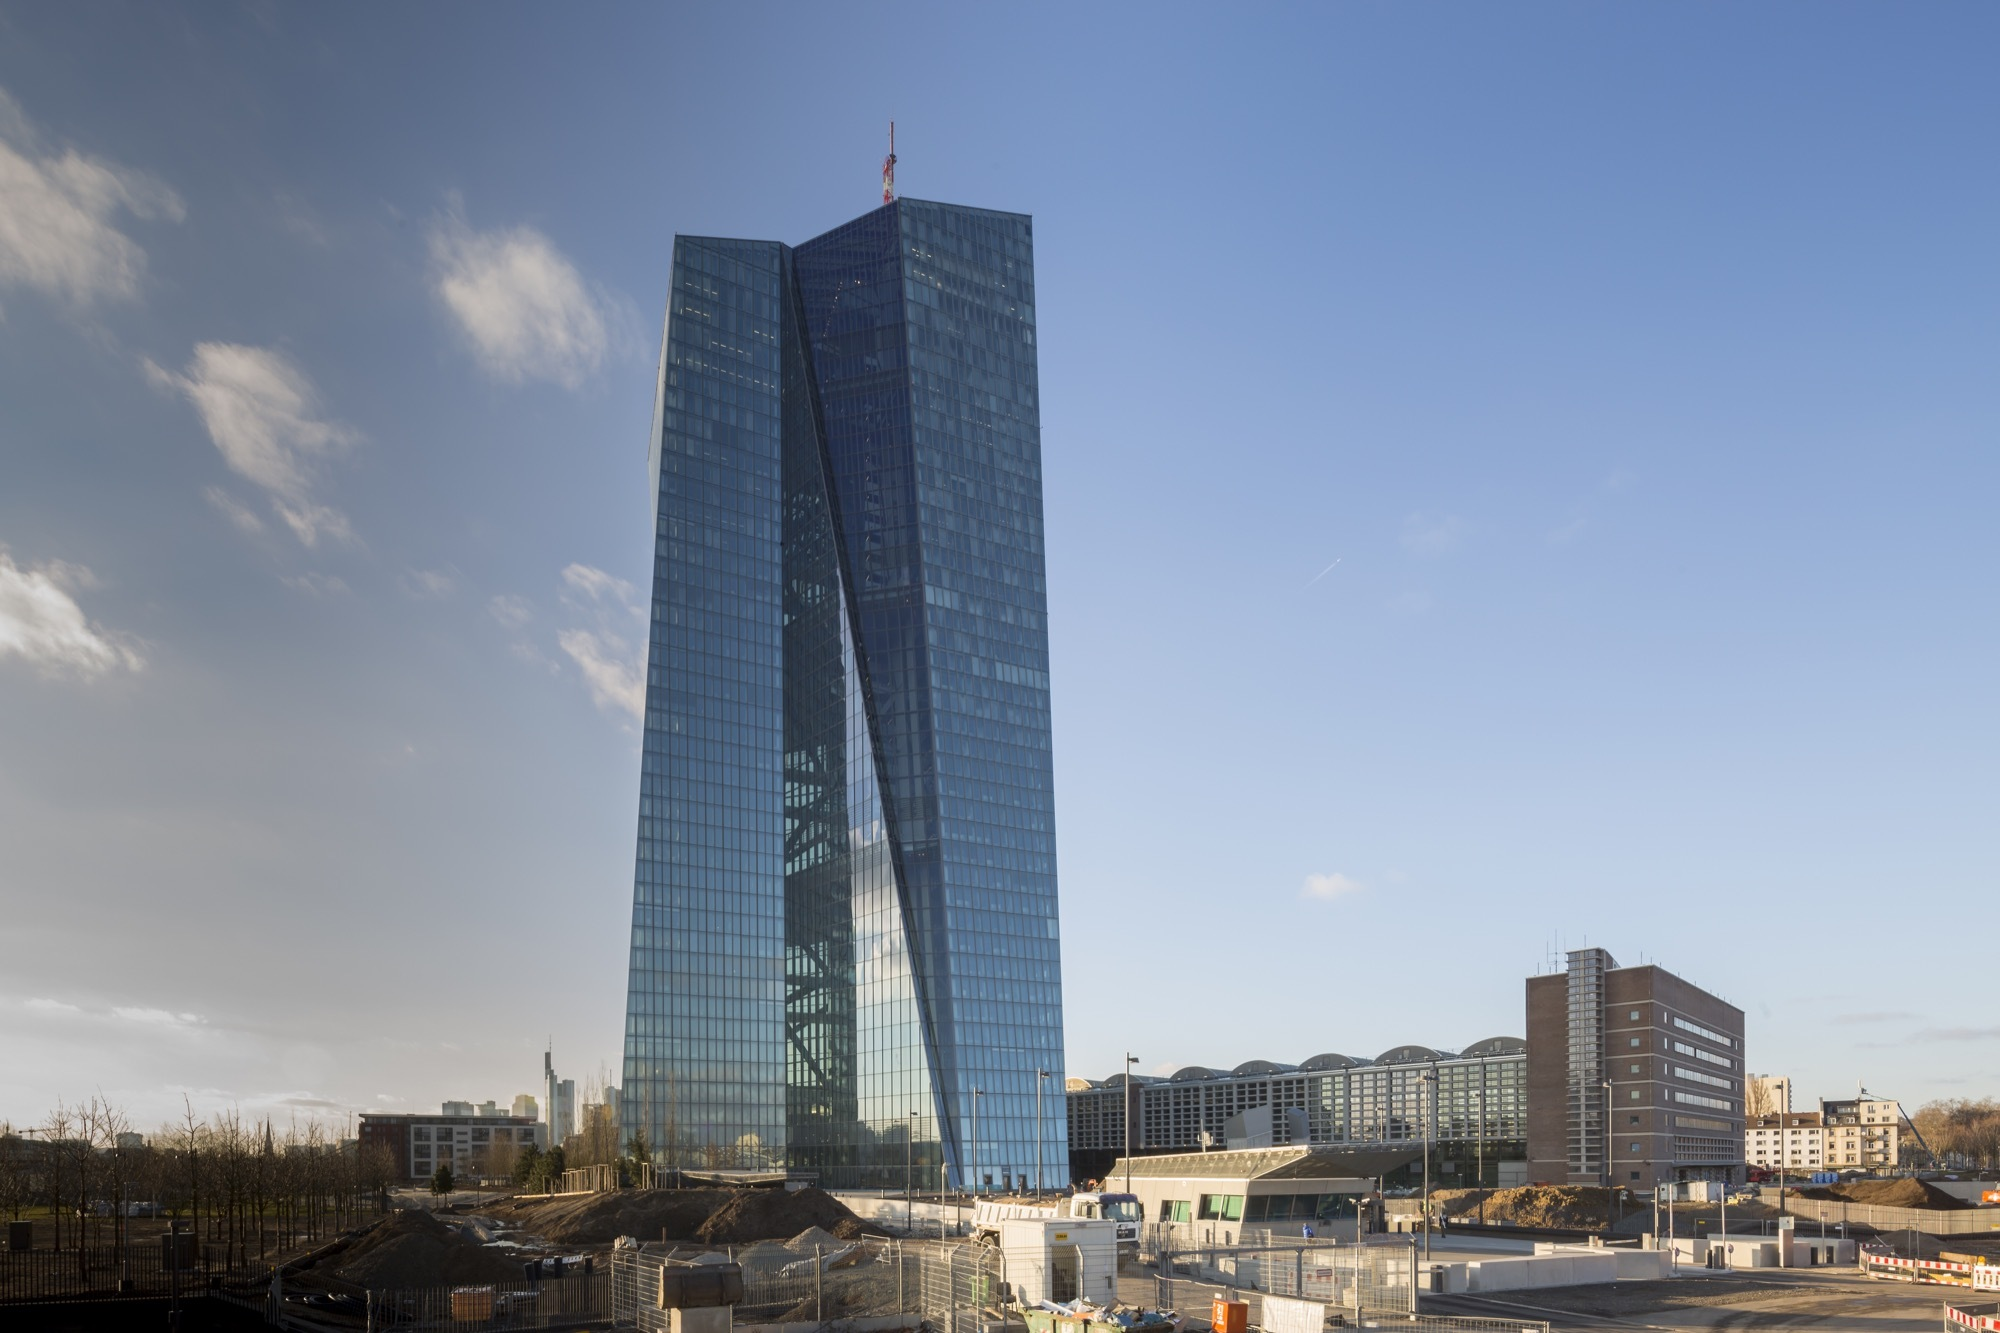 Gallery Of European Central Bank Coop Himmelb L Au 12